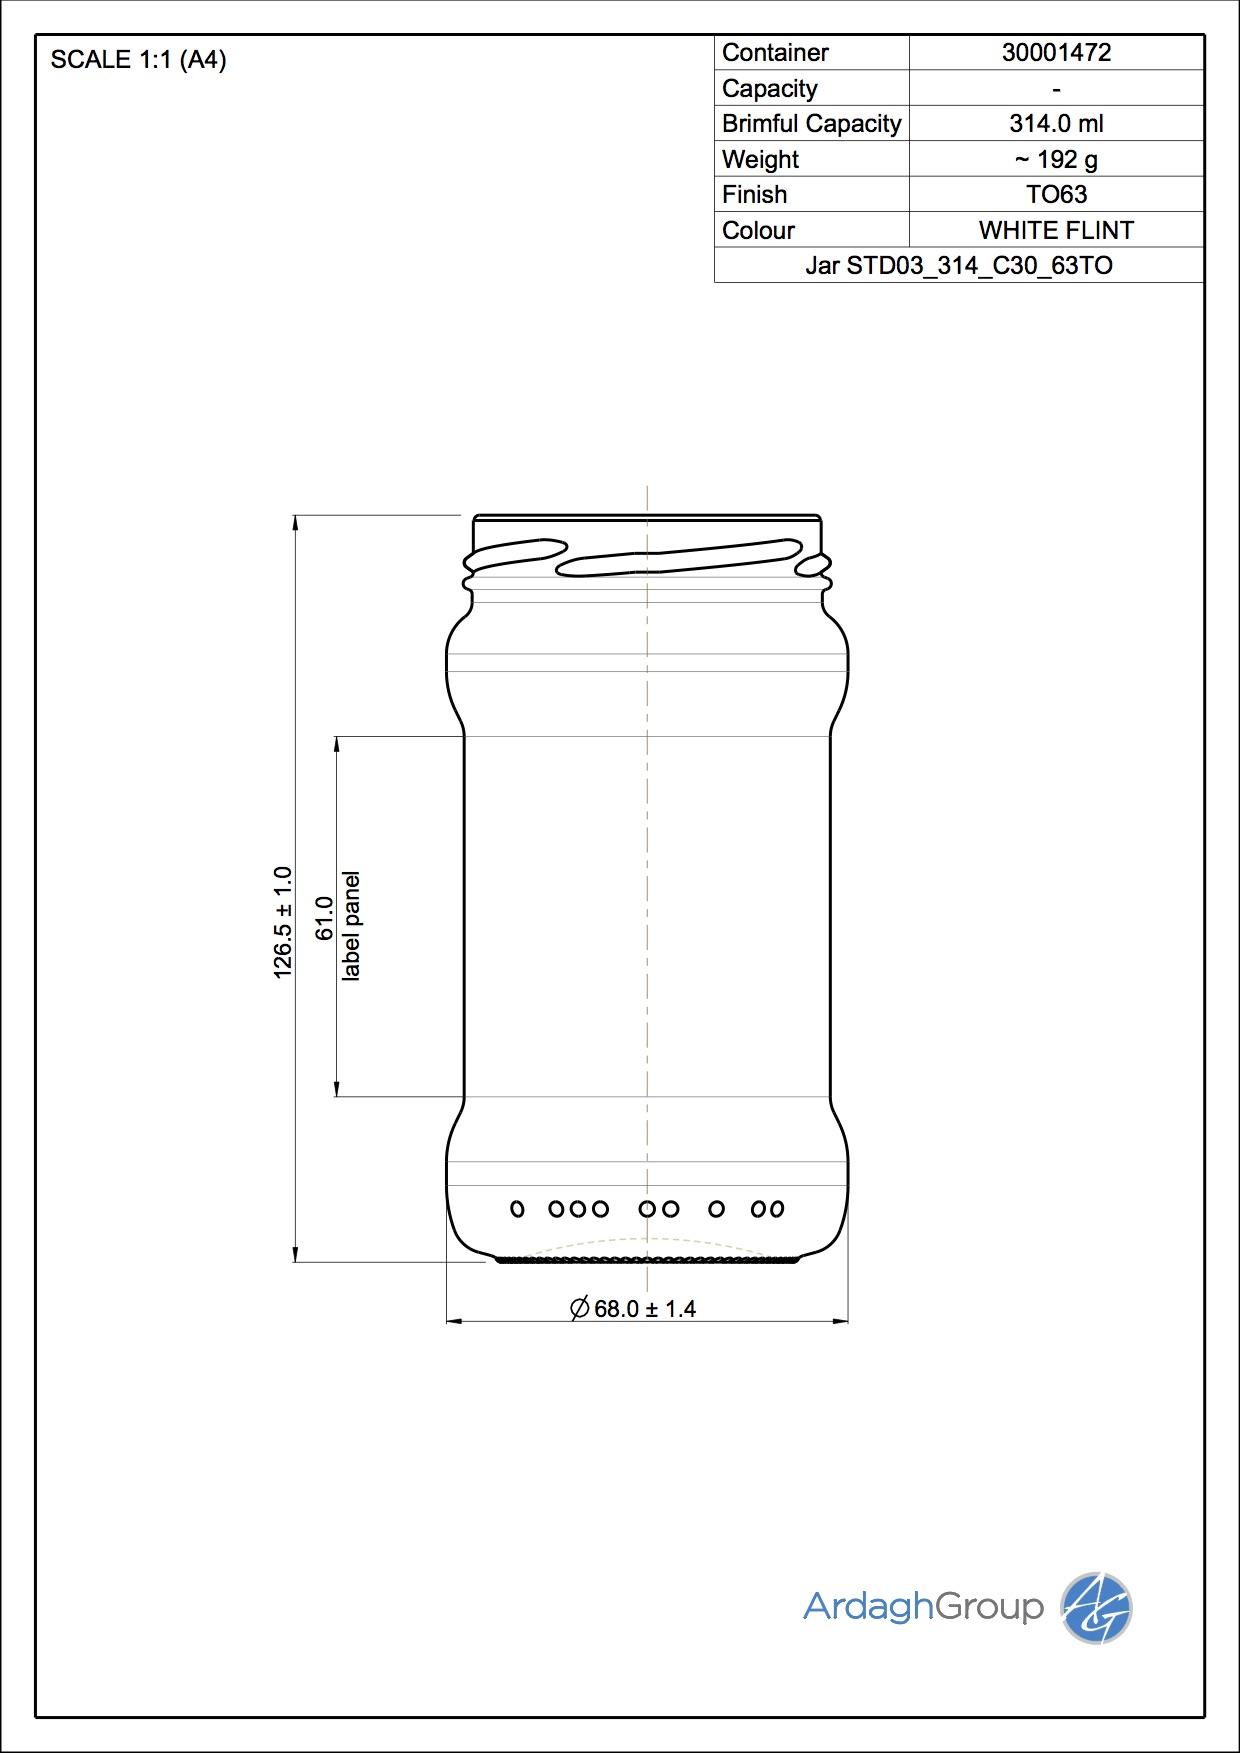 Jar STD03 314 C30 63TO